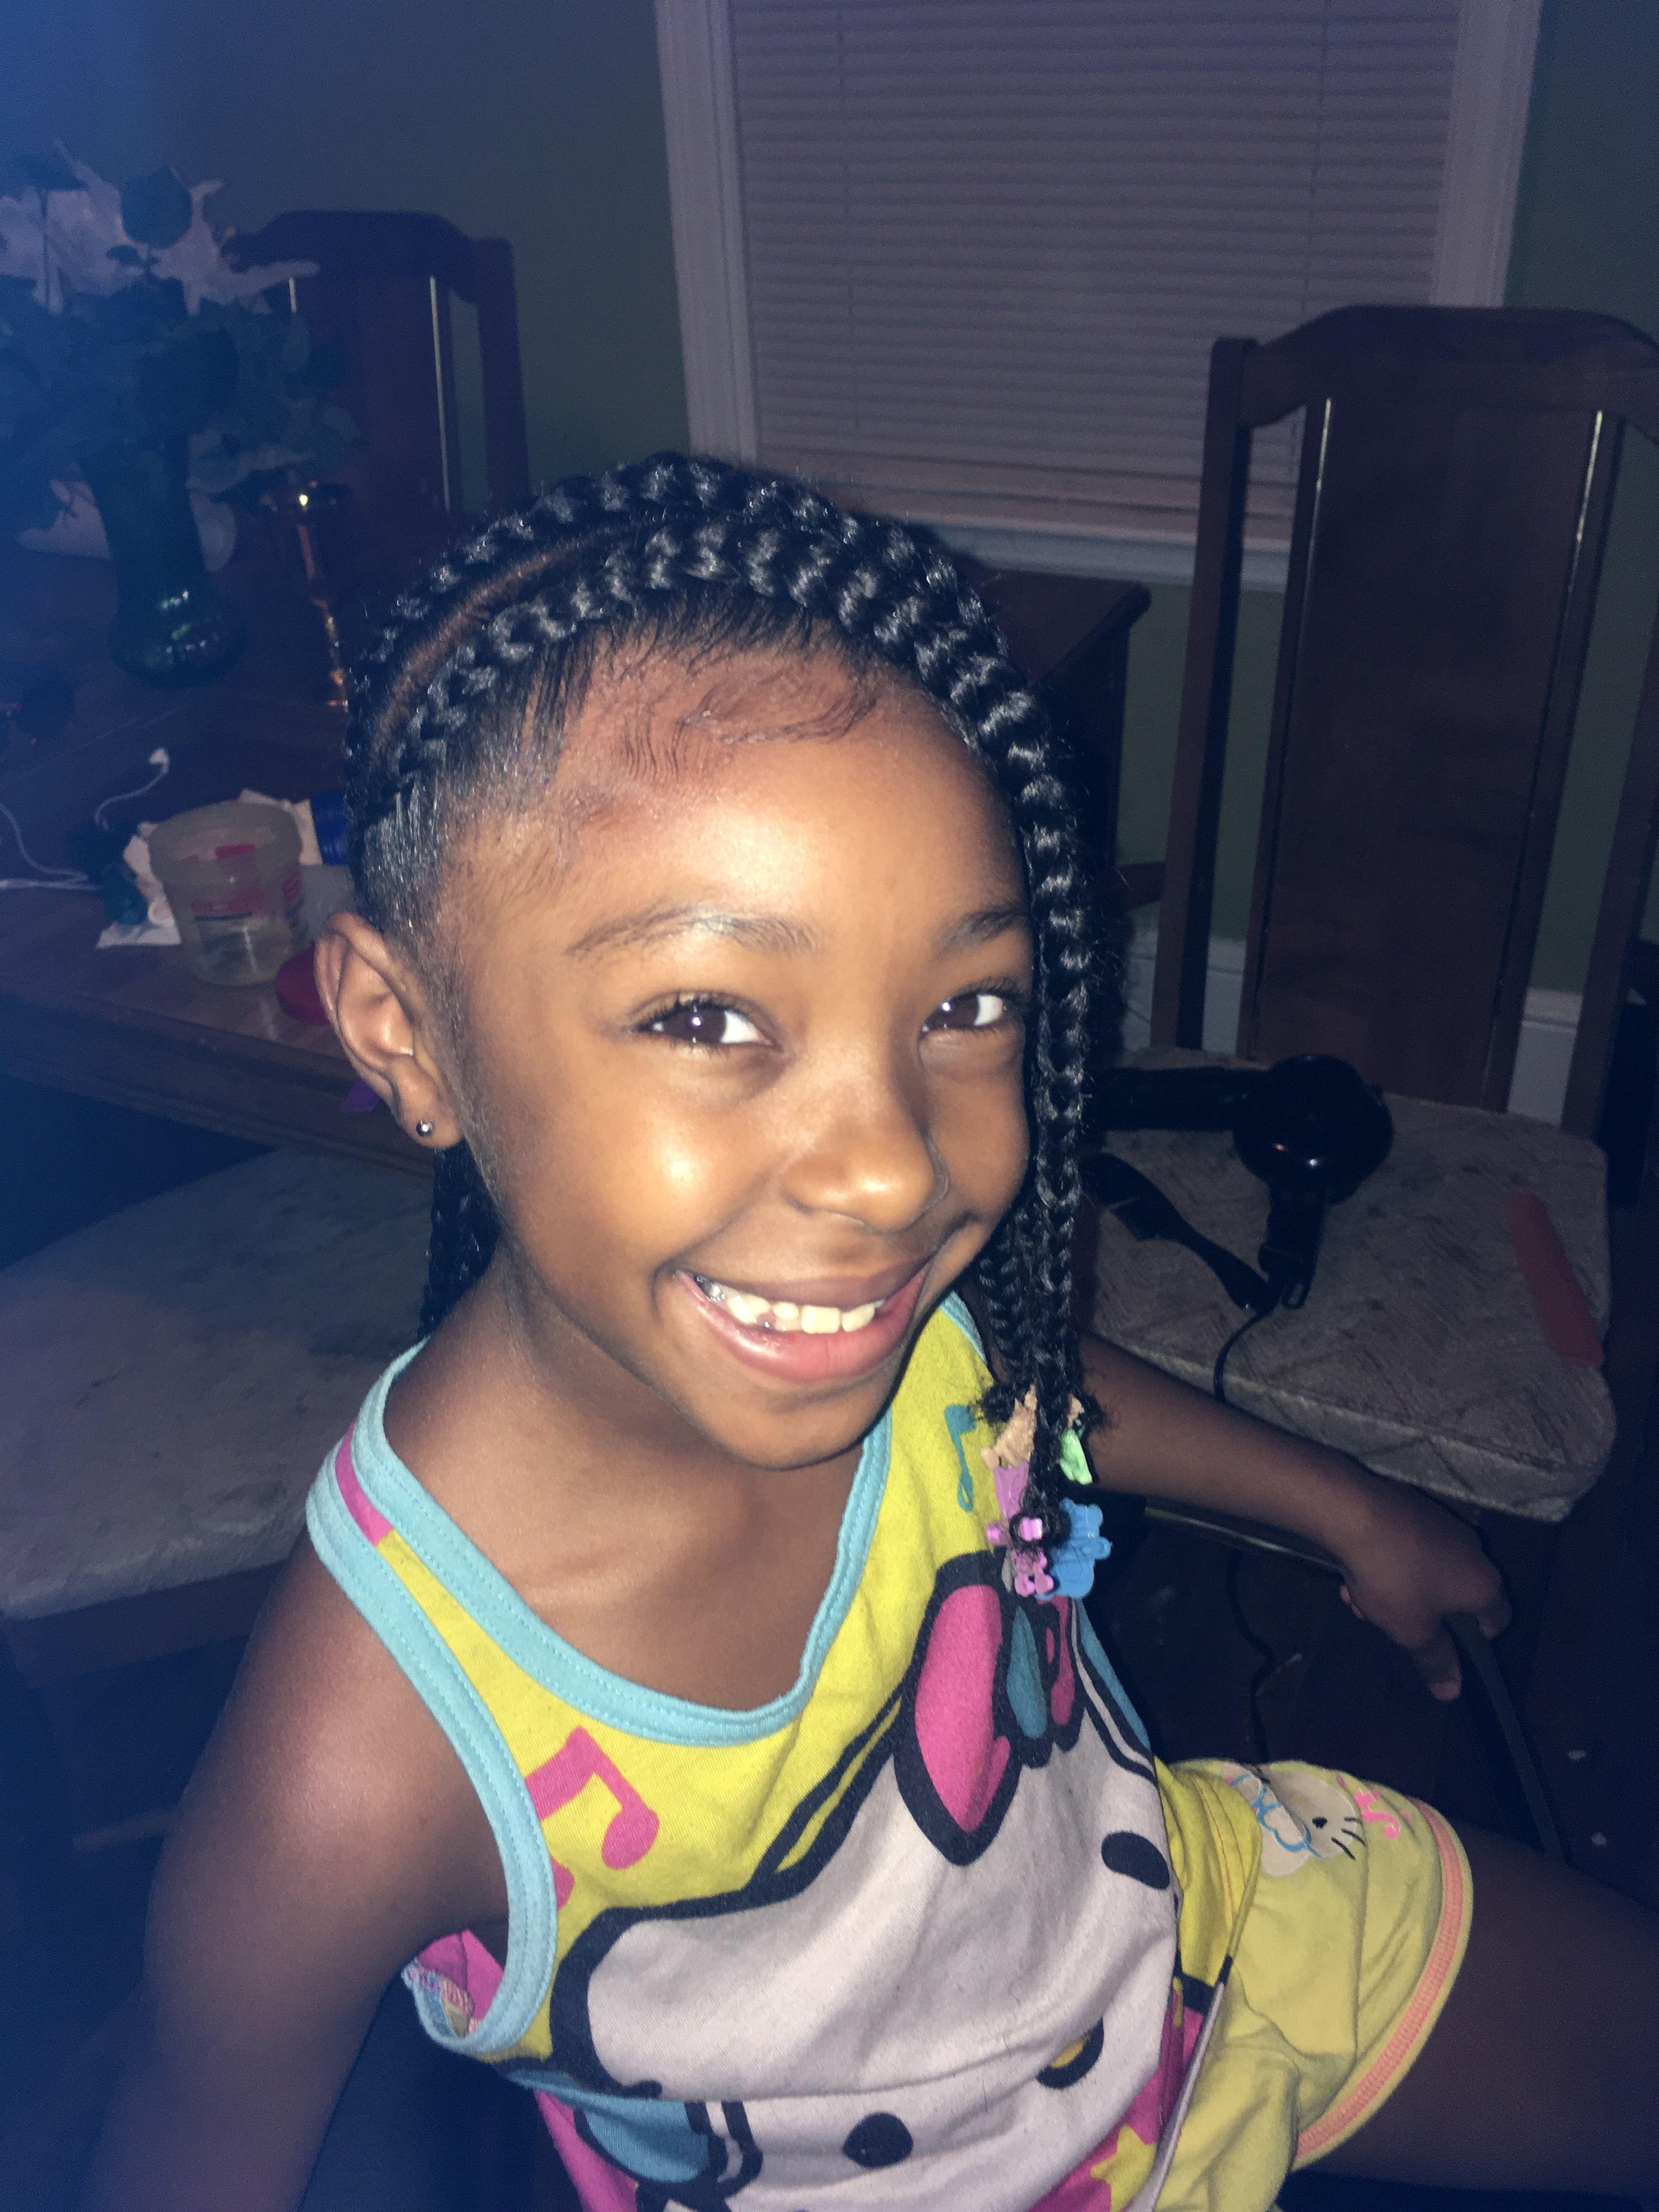 Pin by rouge caldo on kids braids pinterest kid braids